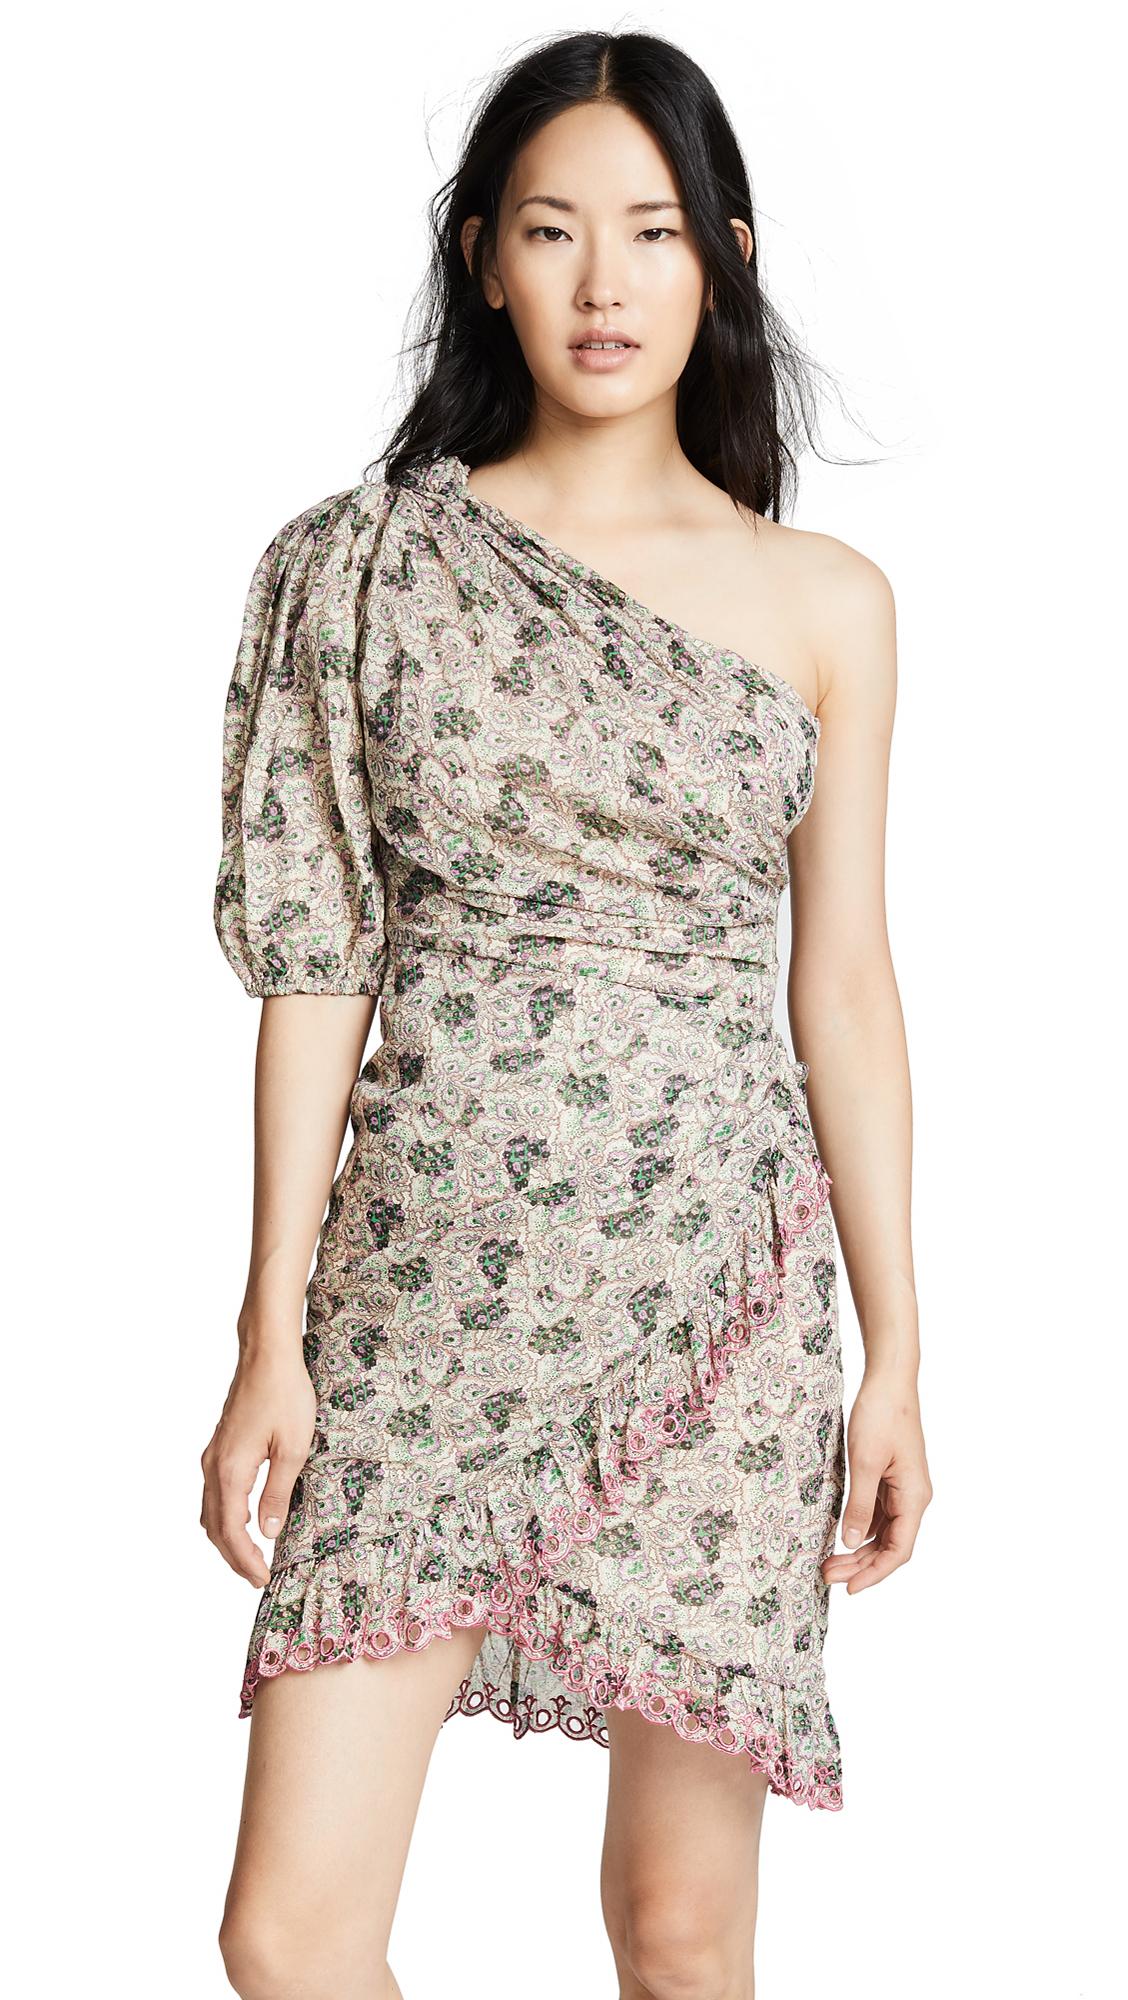 Isabel Marant Etoile Esther Dress In Ecru